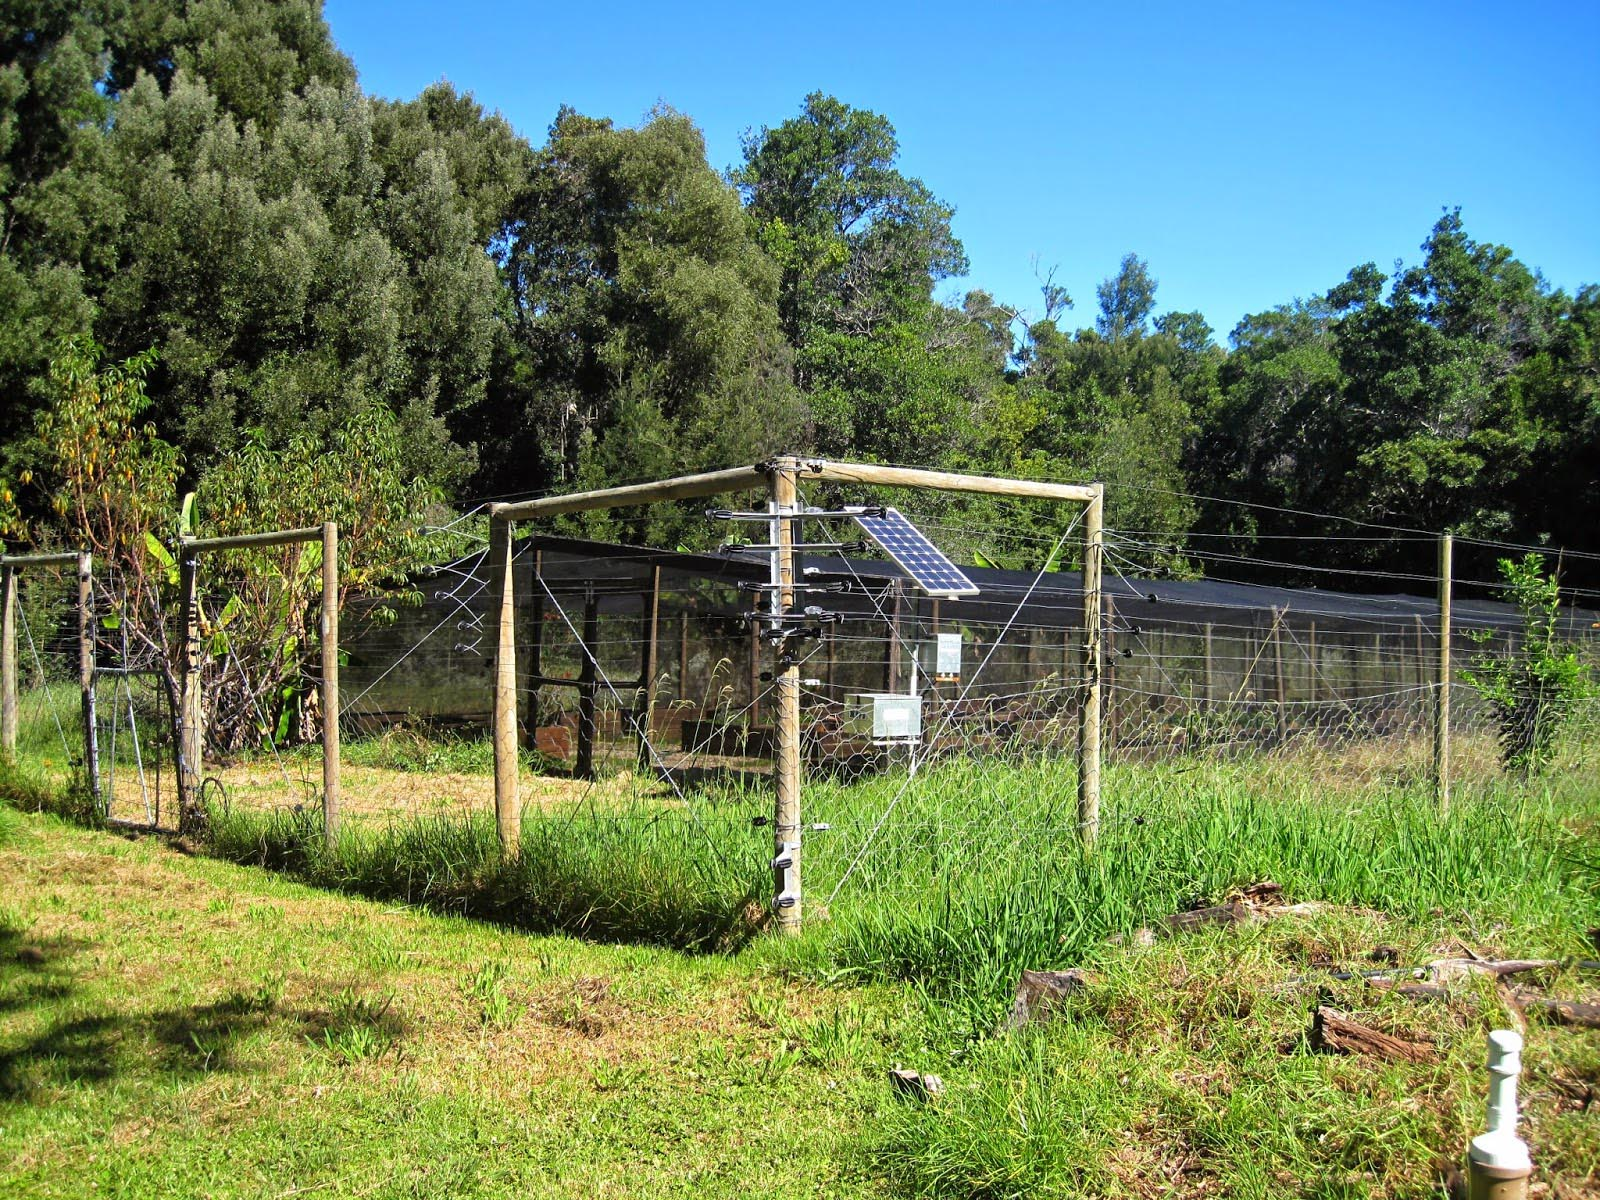 Solar Powered Electric Fence Kit For Garden | Garden Design